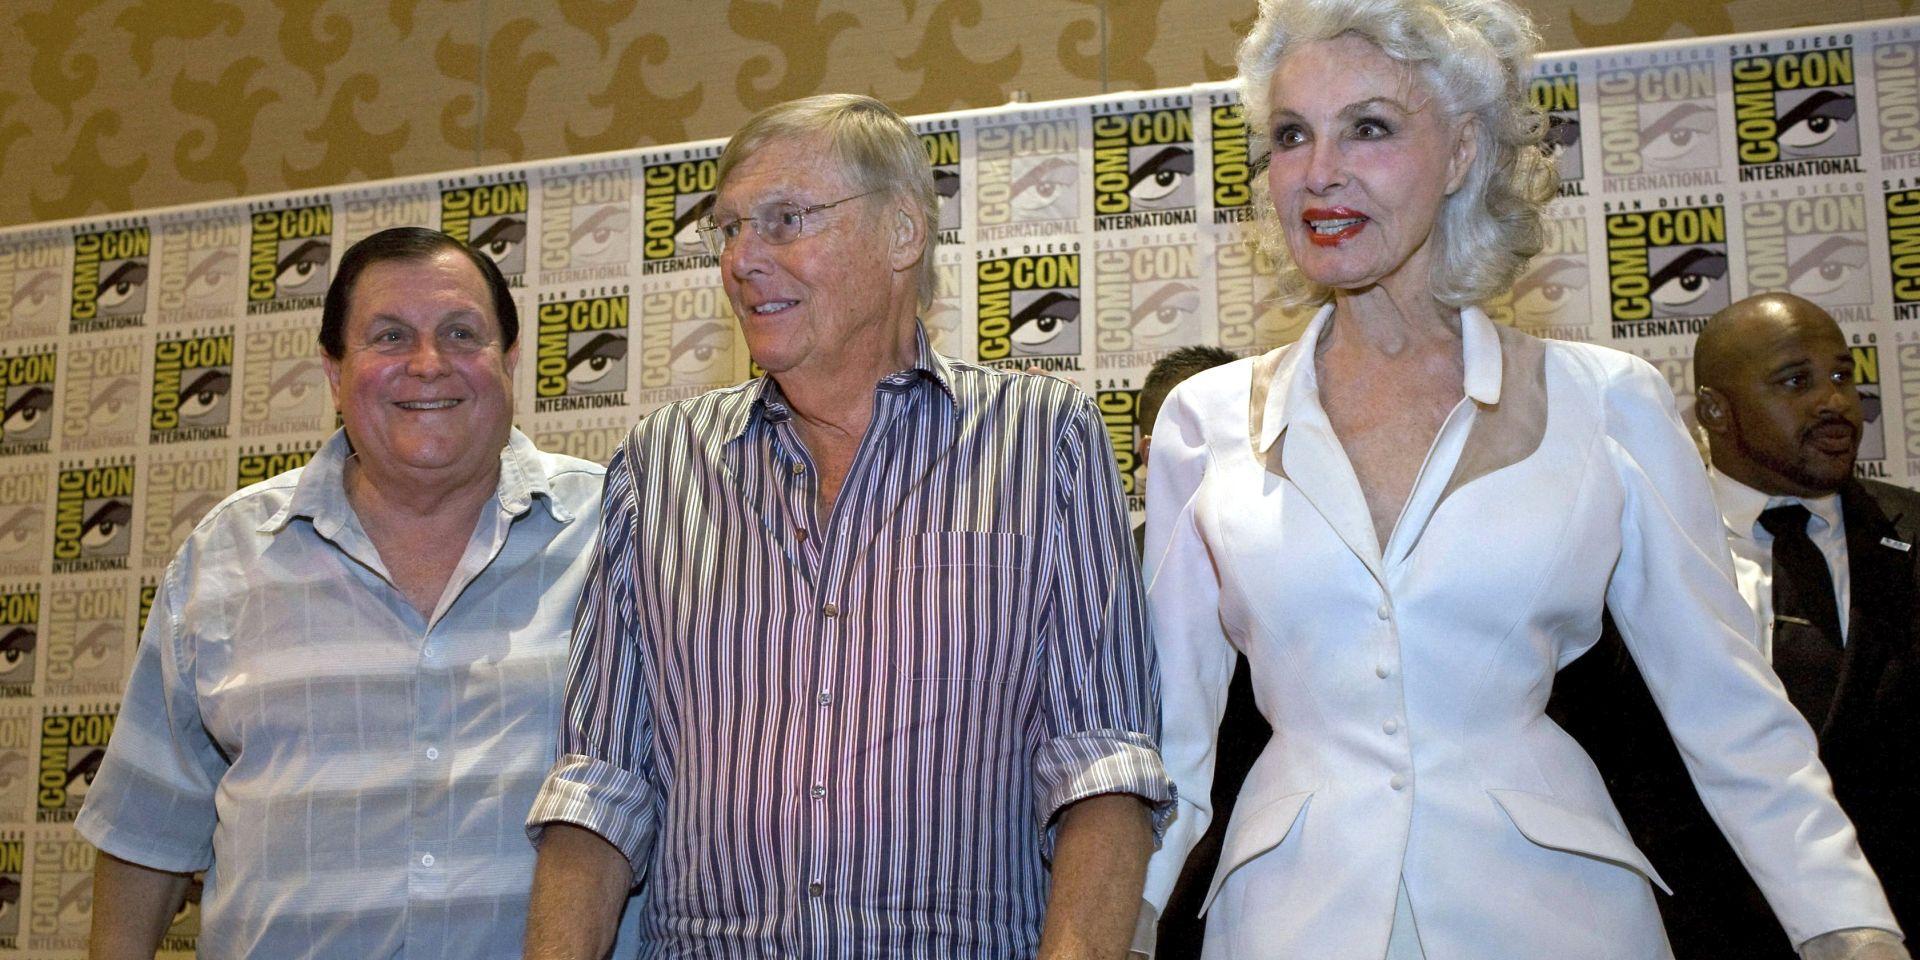 Umro glumac Adam West, prvi Batman